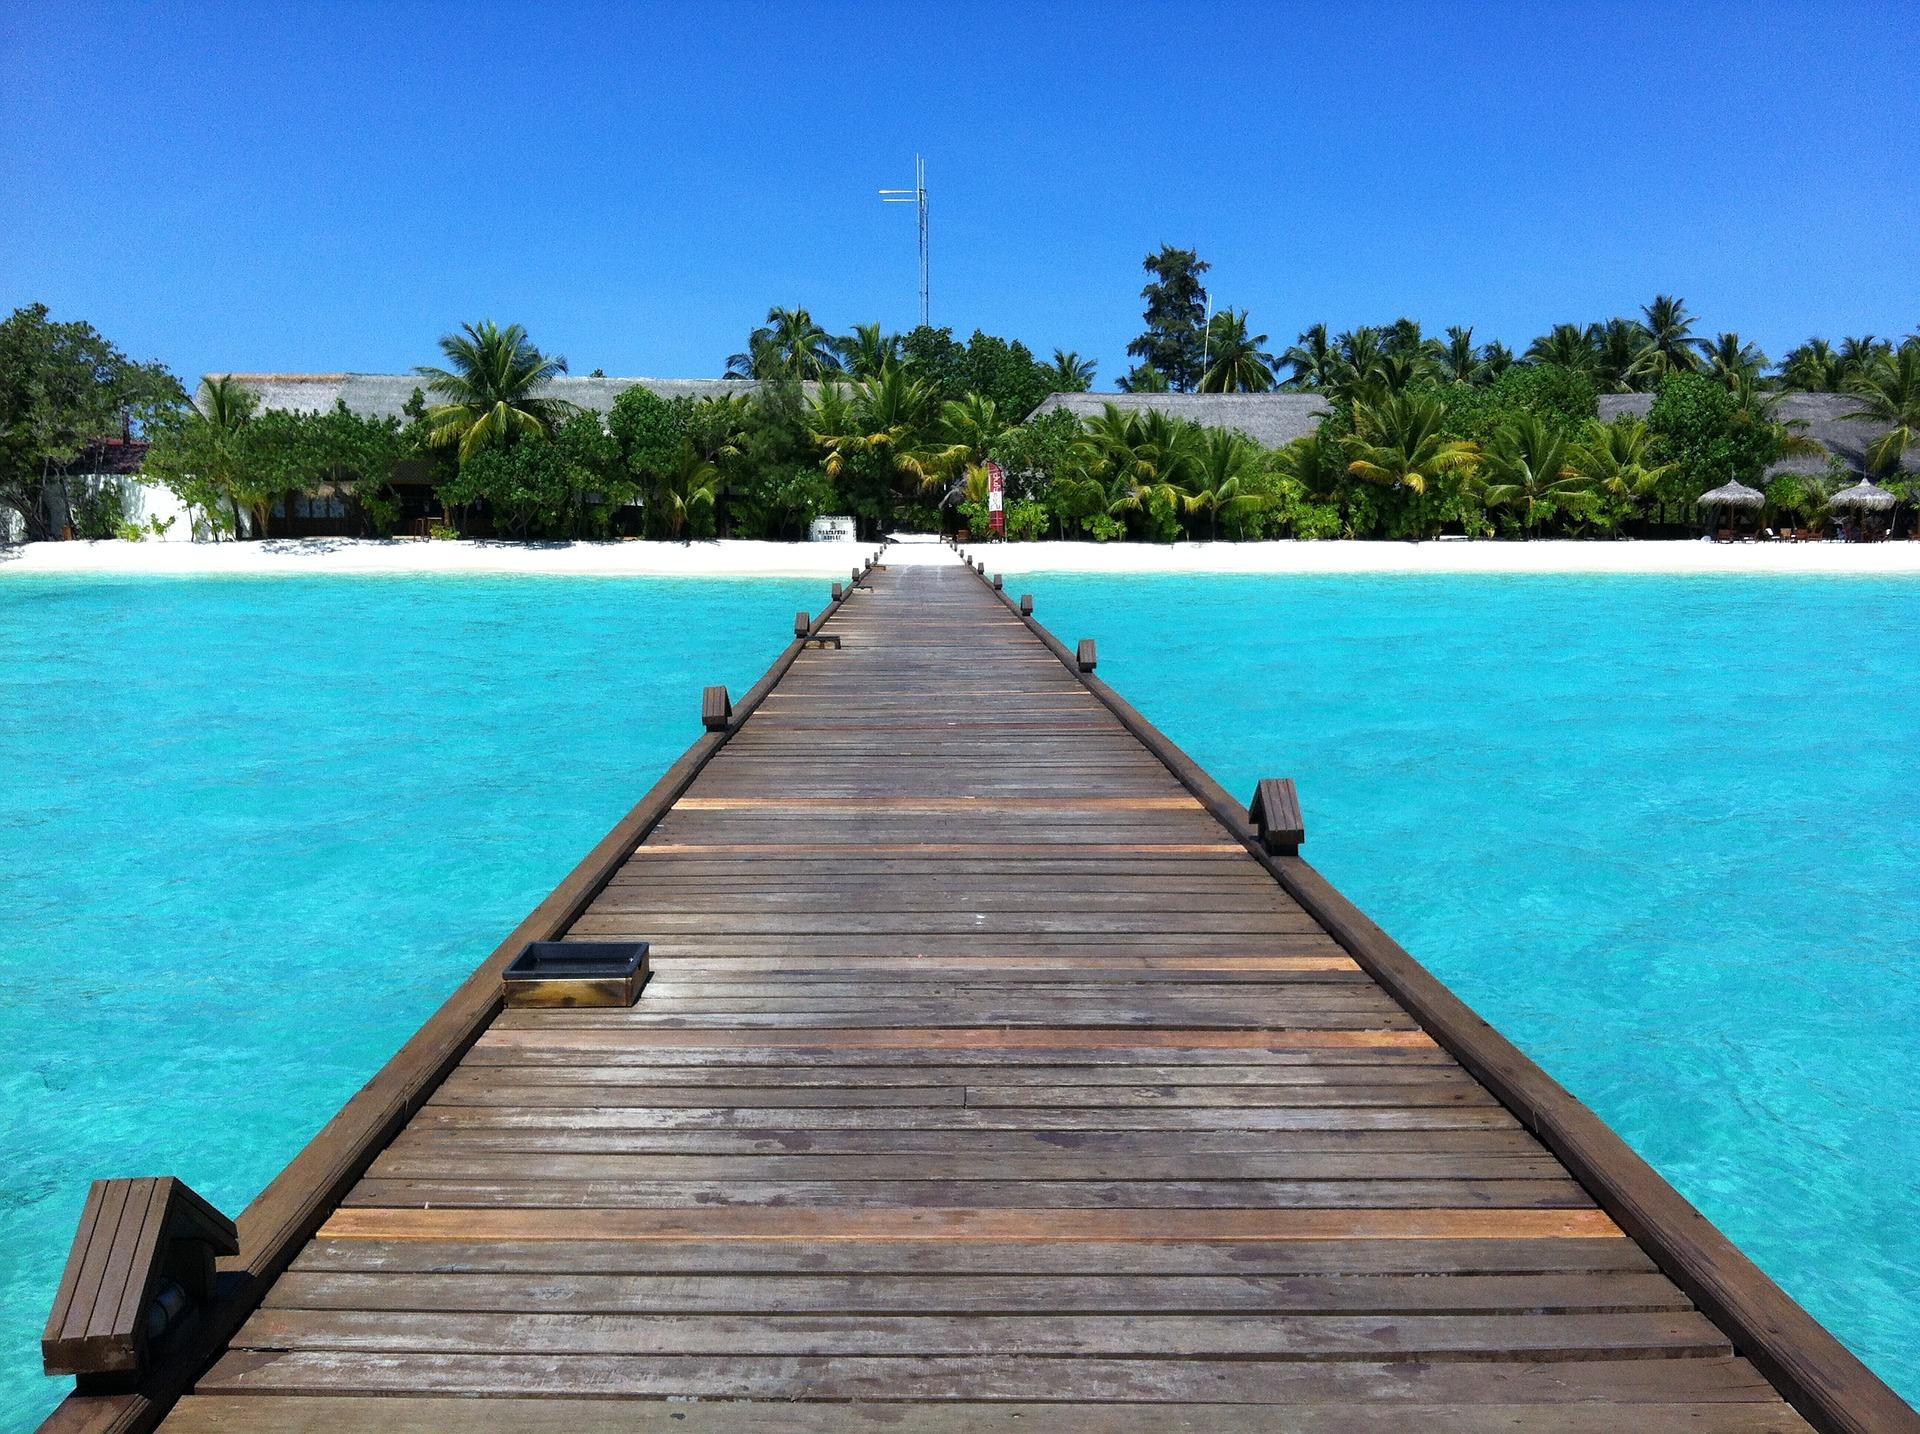 Kuredu Island resort in Maldives